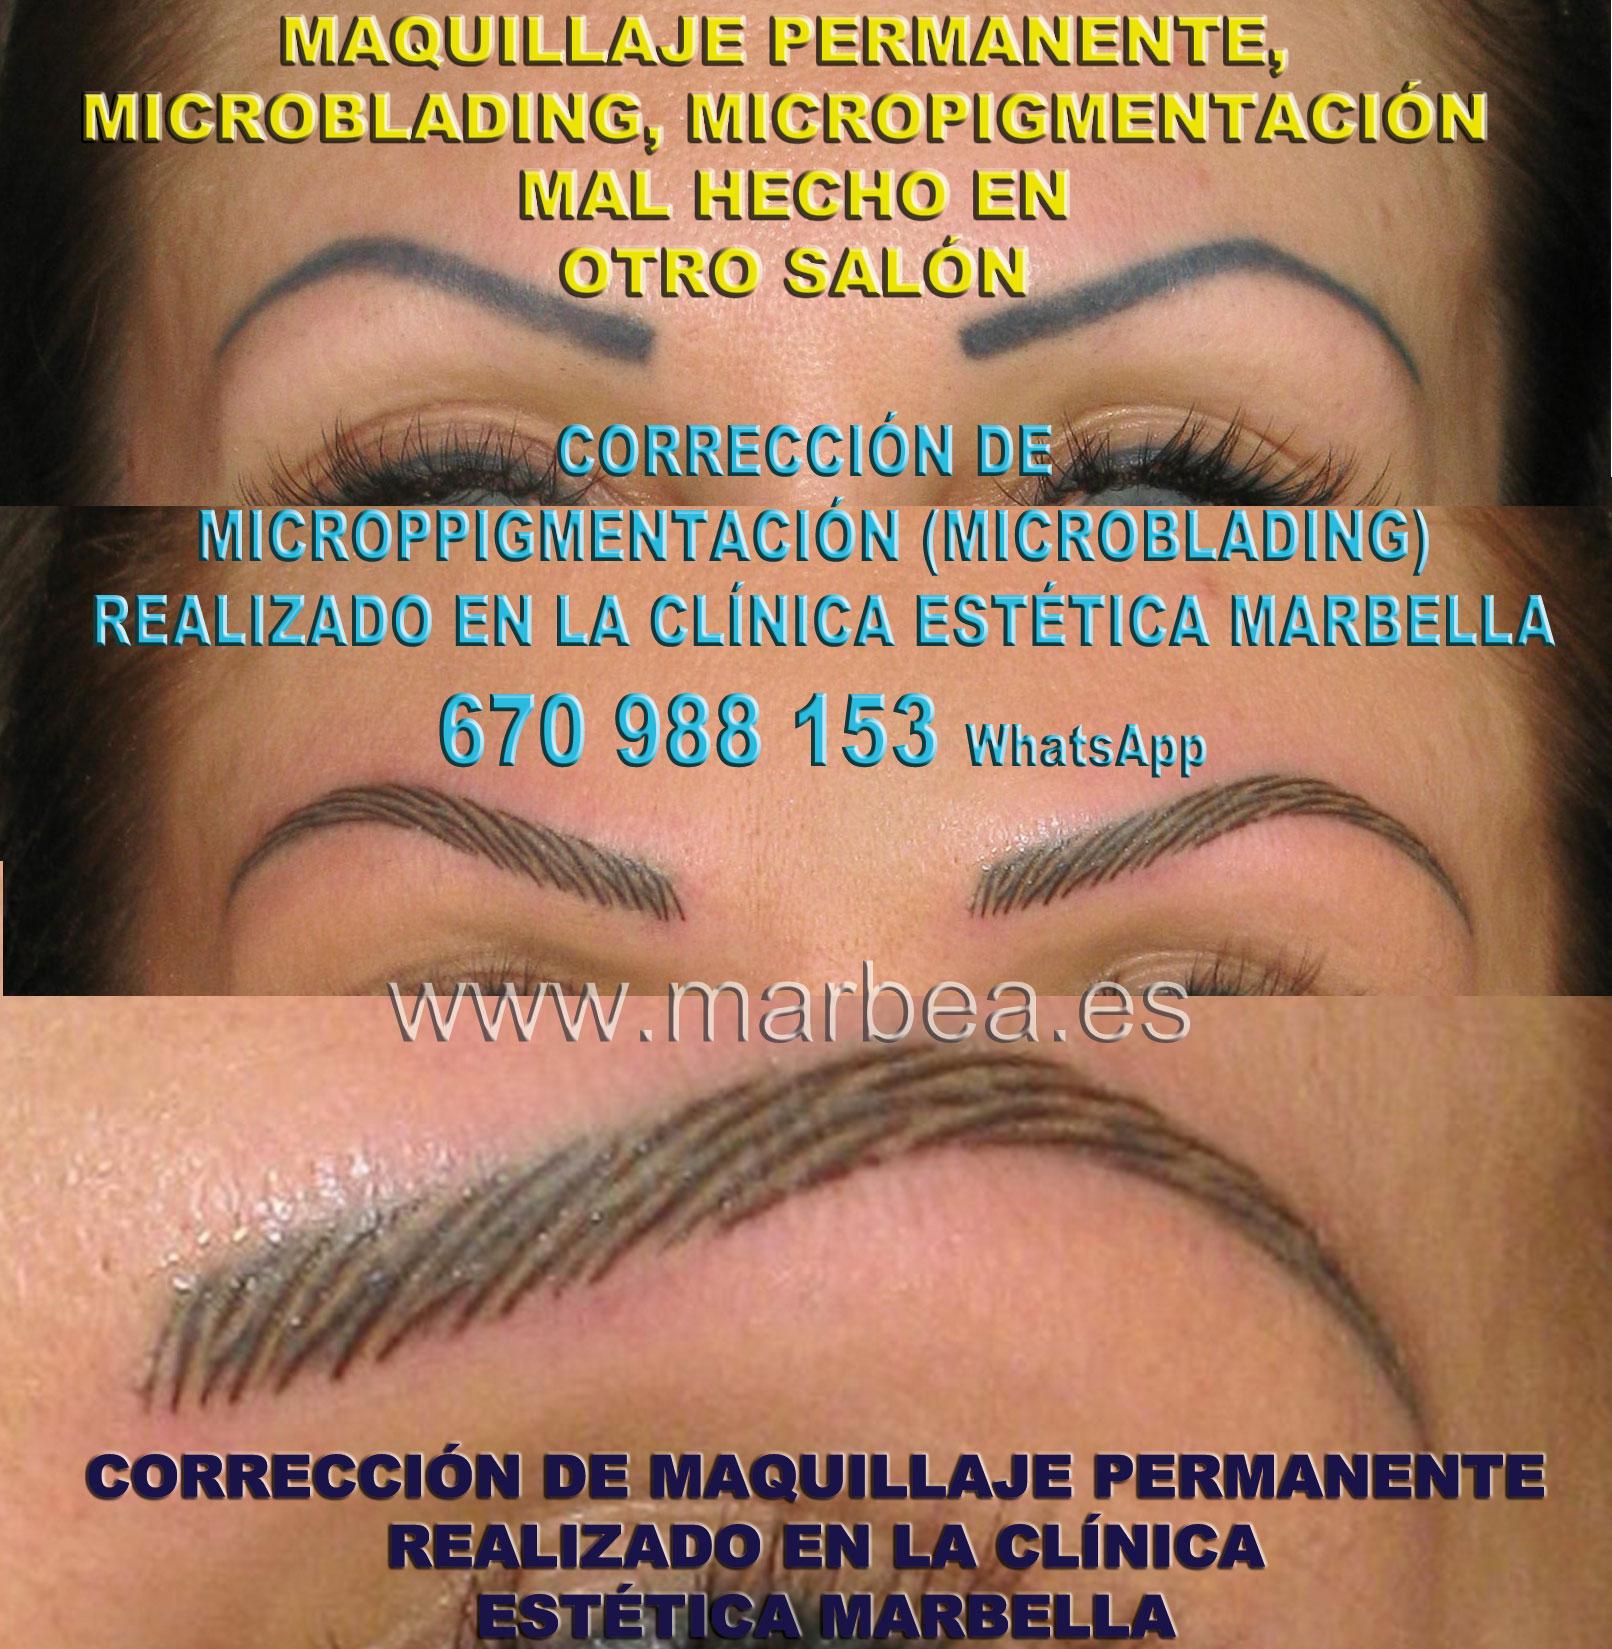 MAQUILLAJE PERMANENTE CEJAS MAL HECHO clínica estética micropigmentación entrega micropigmentacion correctiva de cejas,micropigmentación correctiva cejas mal hecha